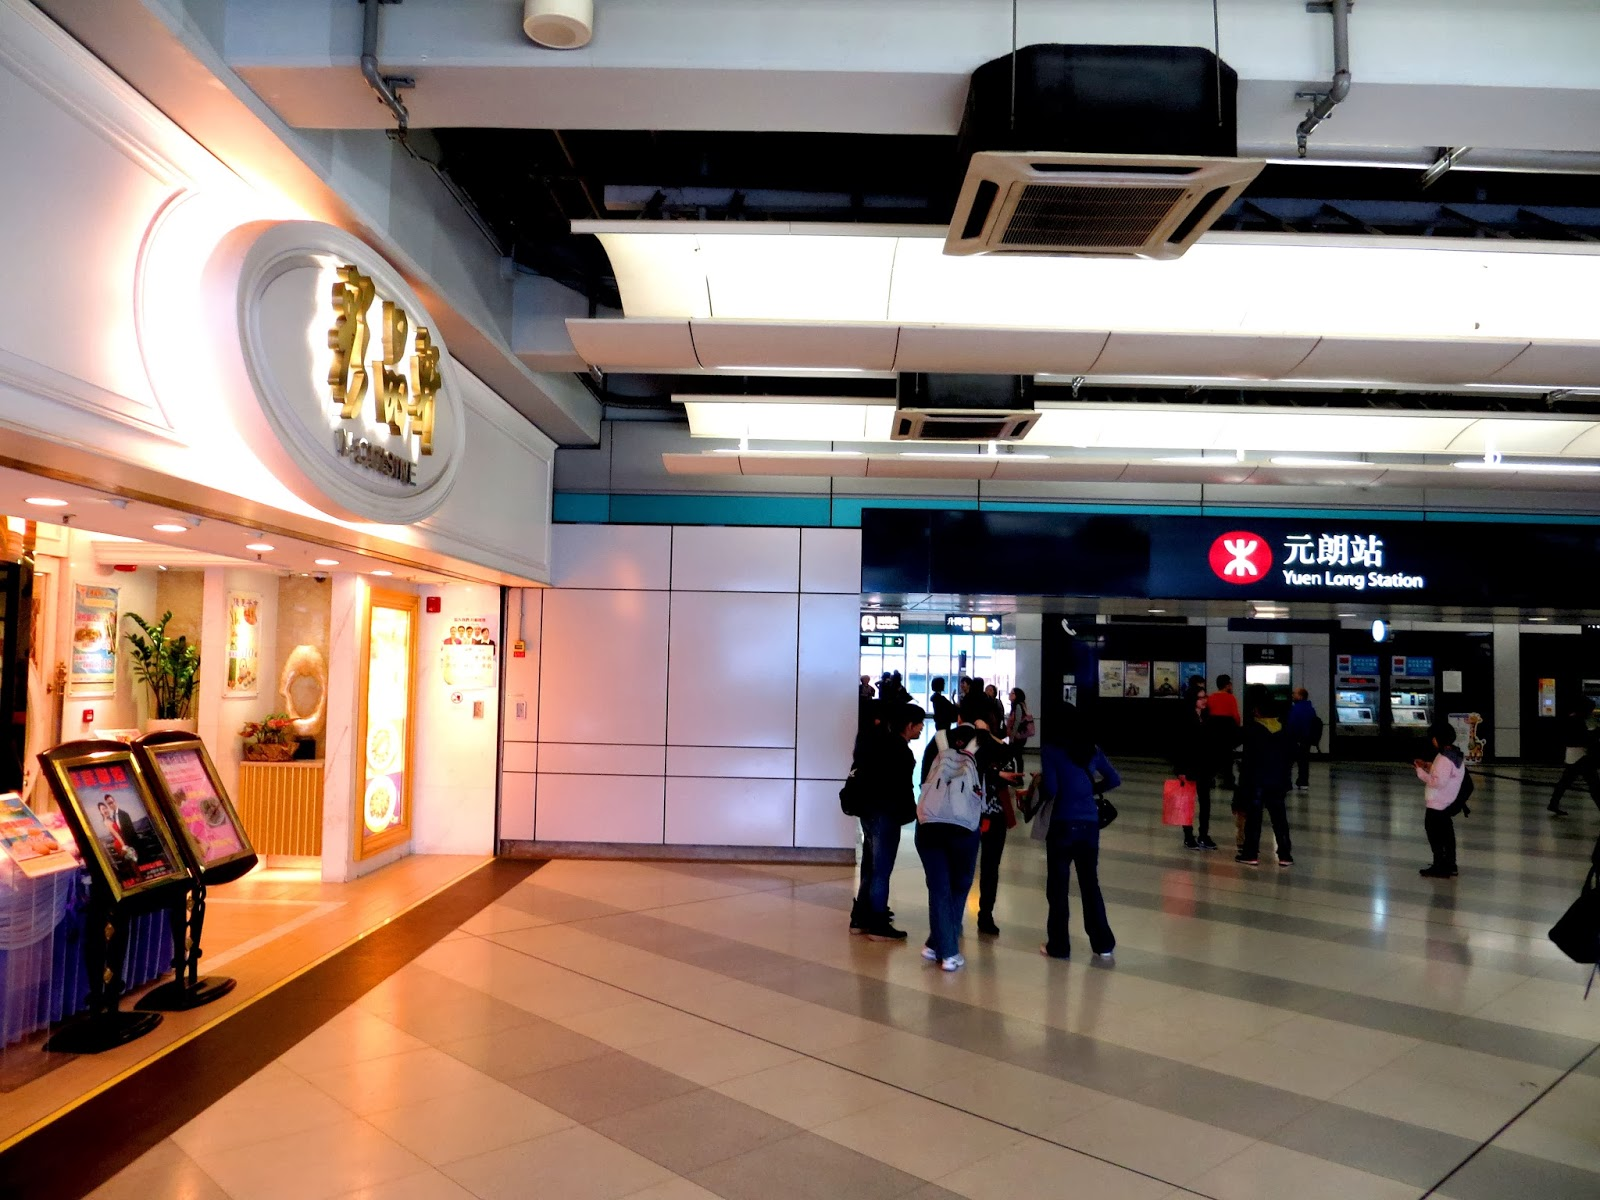 Paul Li Blog: 彩晶軒 V Cuisine - 西鐵線元朗站大堂 點心 Dim Sum